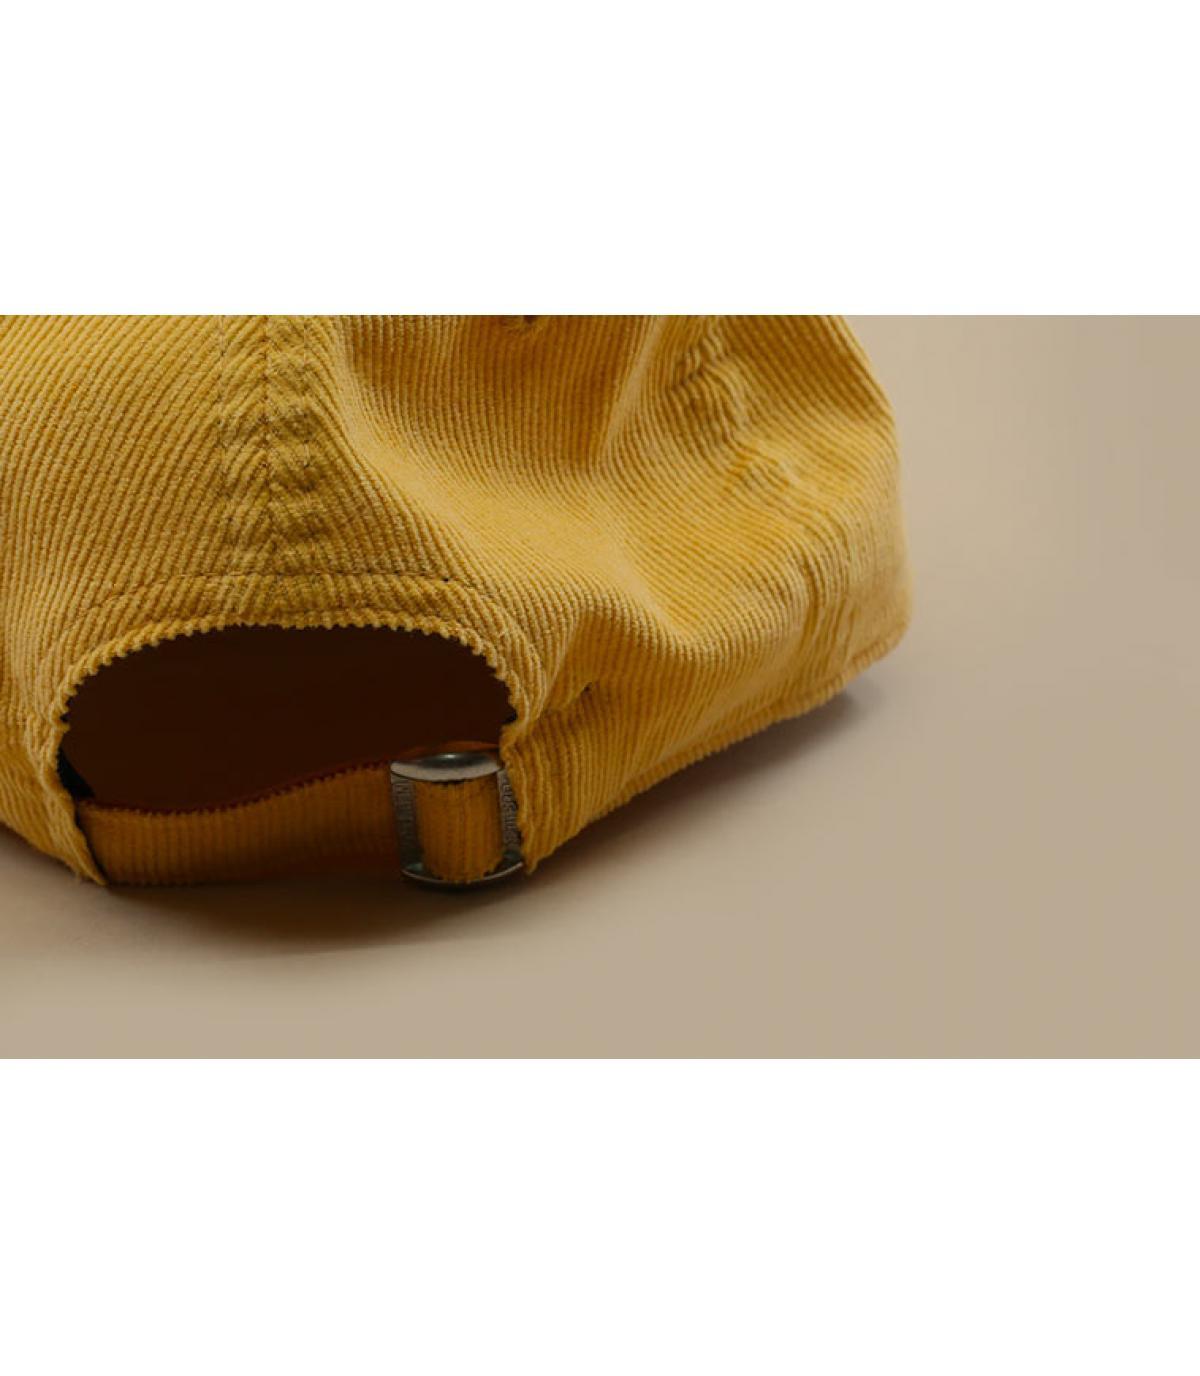 Detalles Cord Pack 940 NY mellow yellow black imagen 5